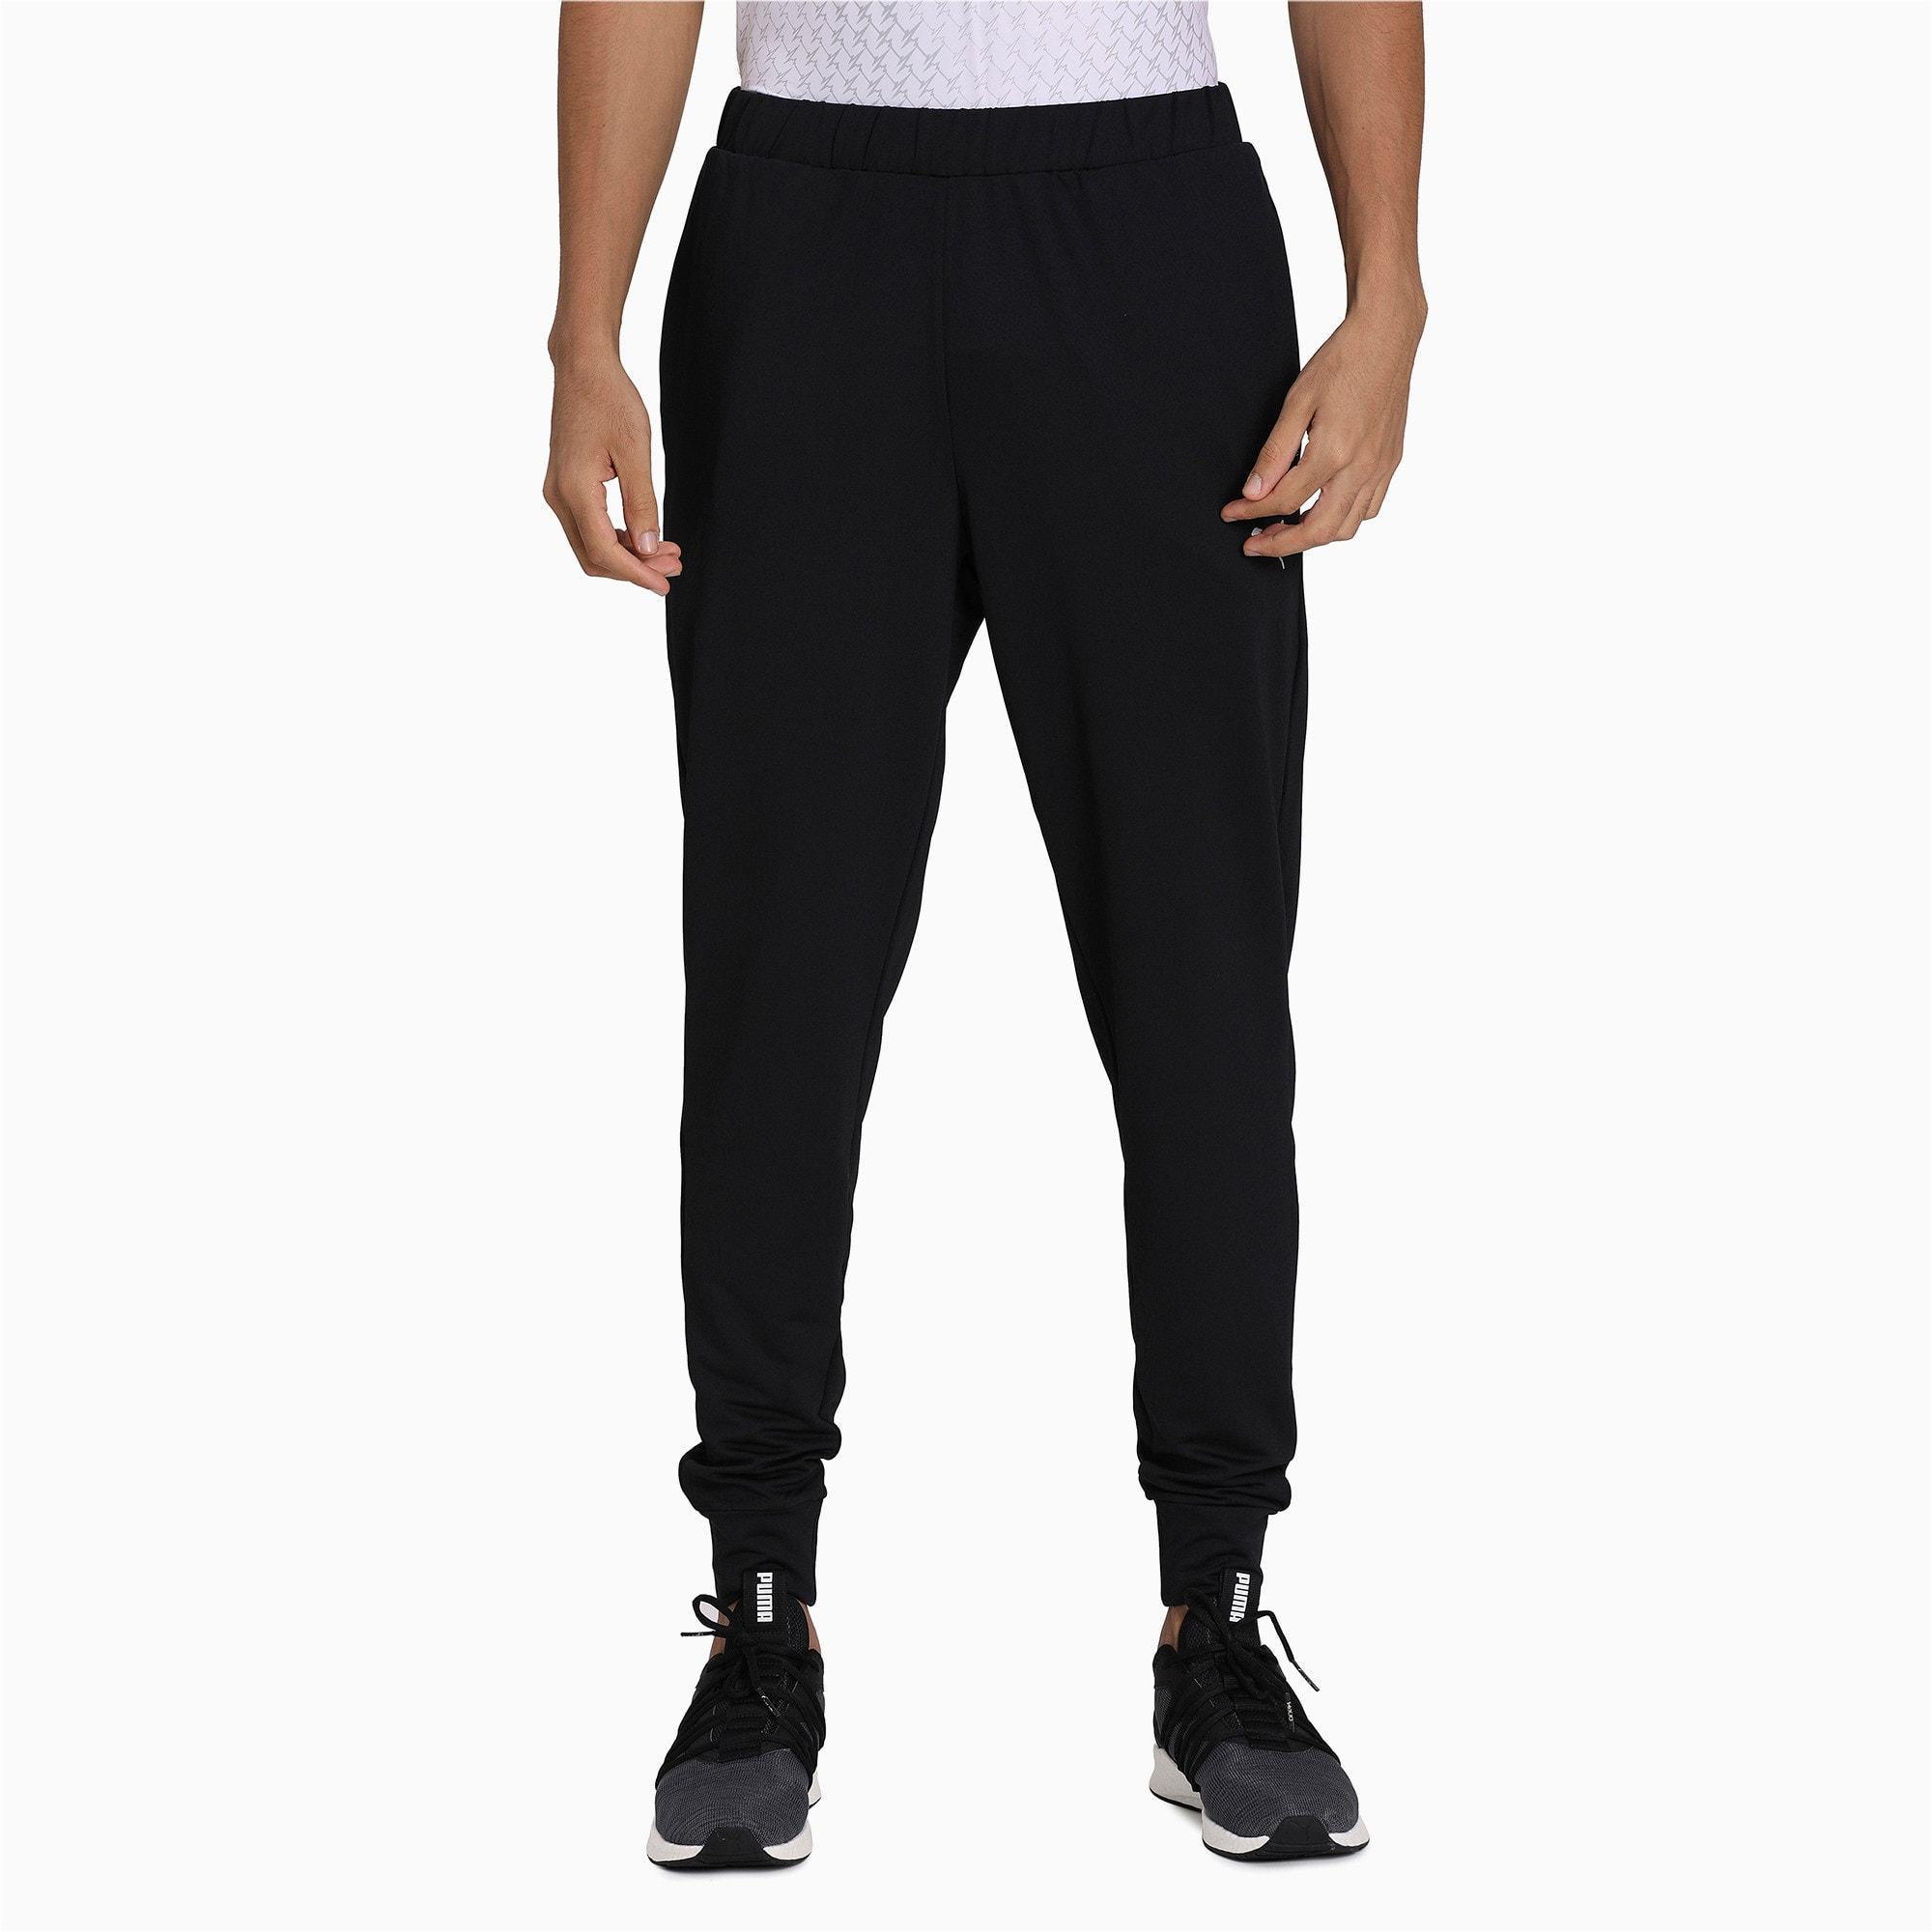 Thumbnail 3 of one8 Men's Active Pants, Puma Black, medium-IND